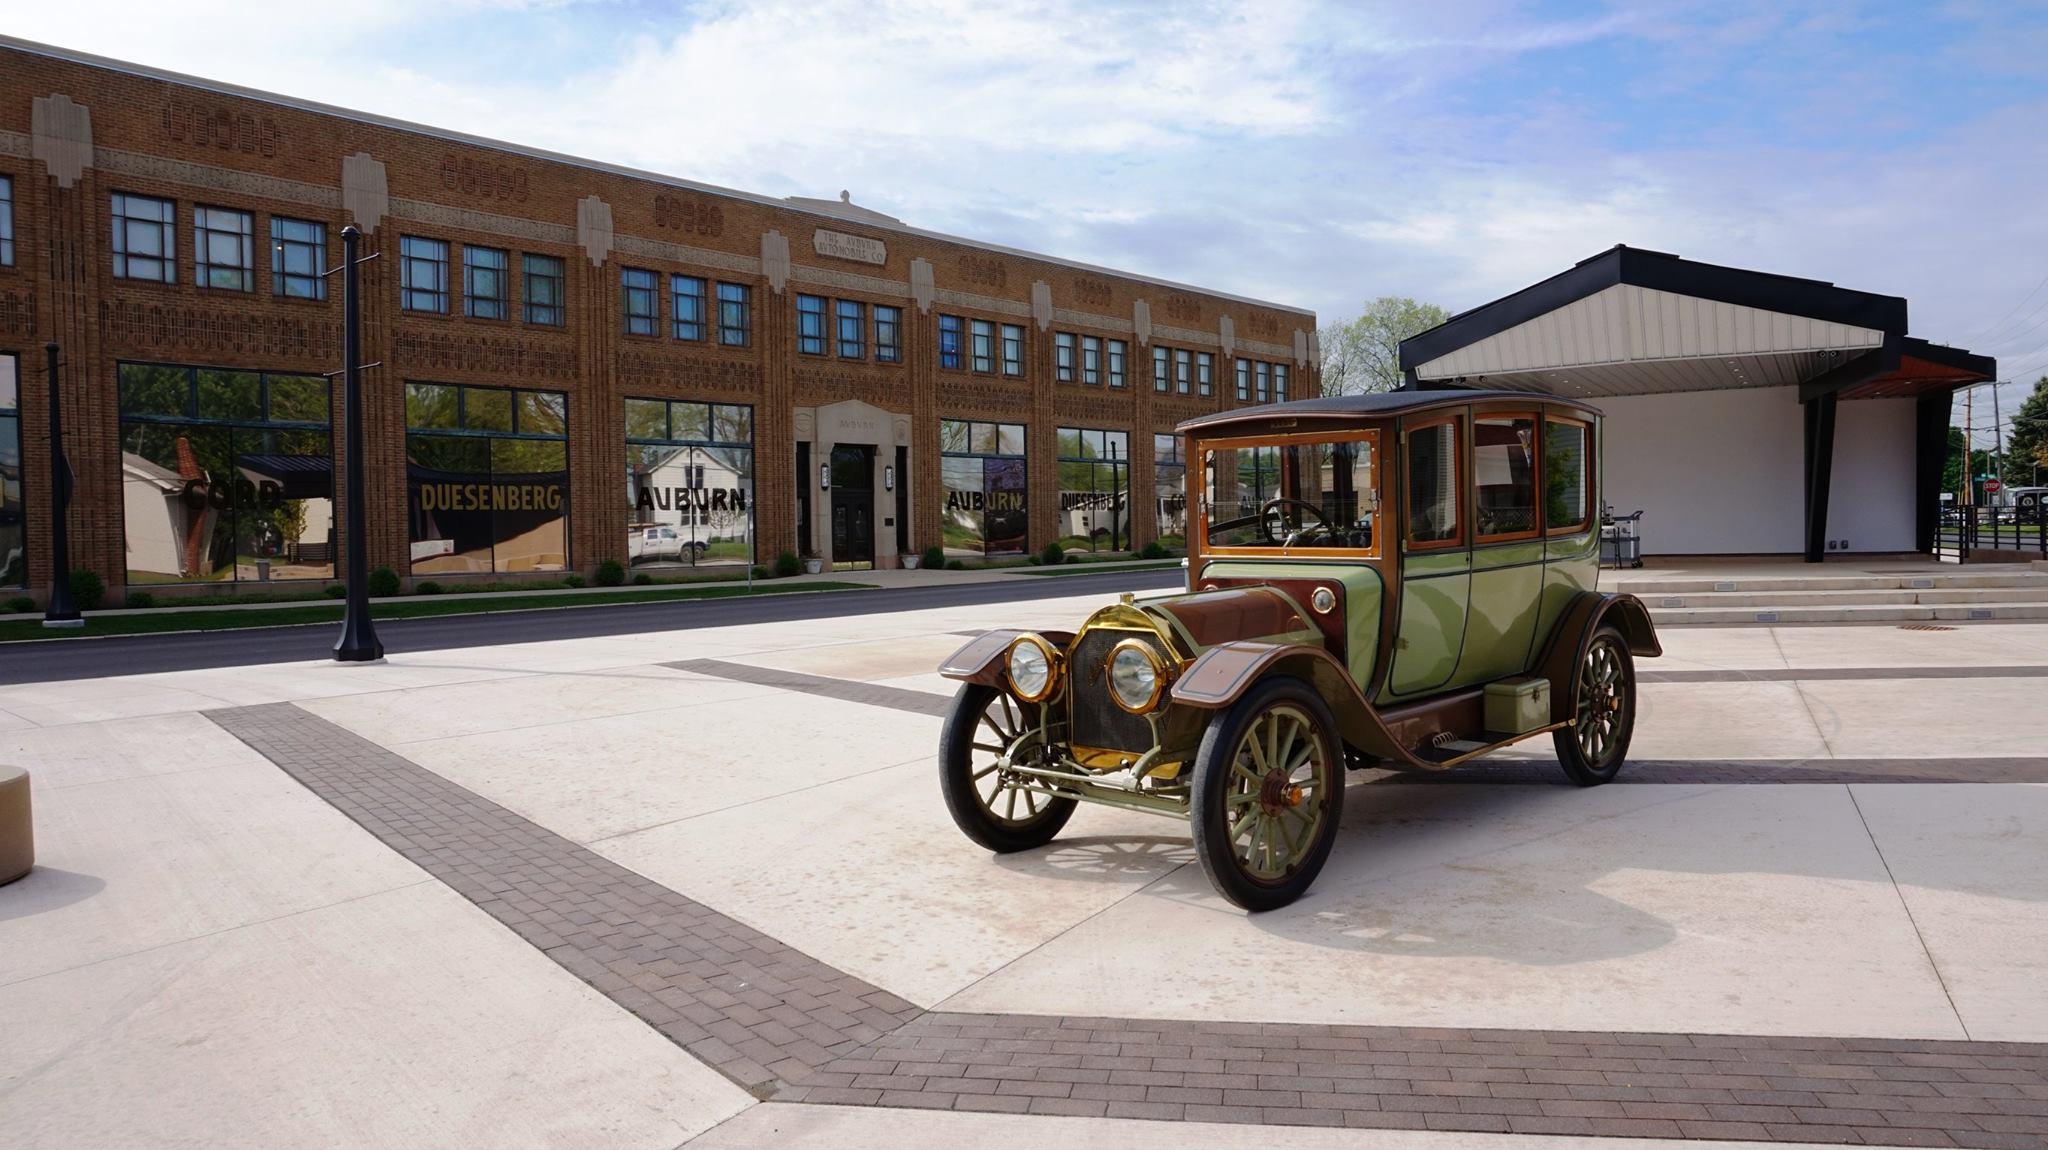 Auburn-Cord-Duesenberg-Automobile-Education-Plaza-and-1912-automobile